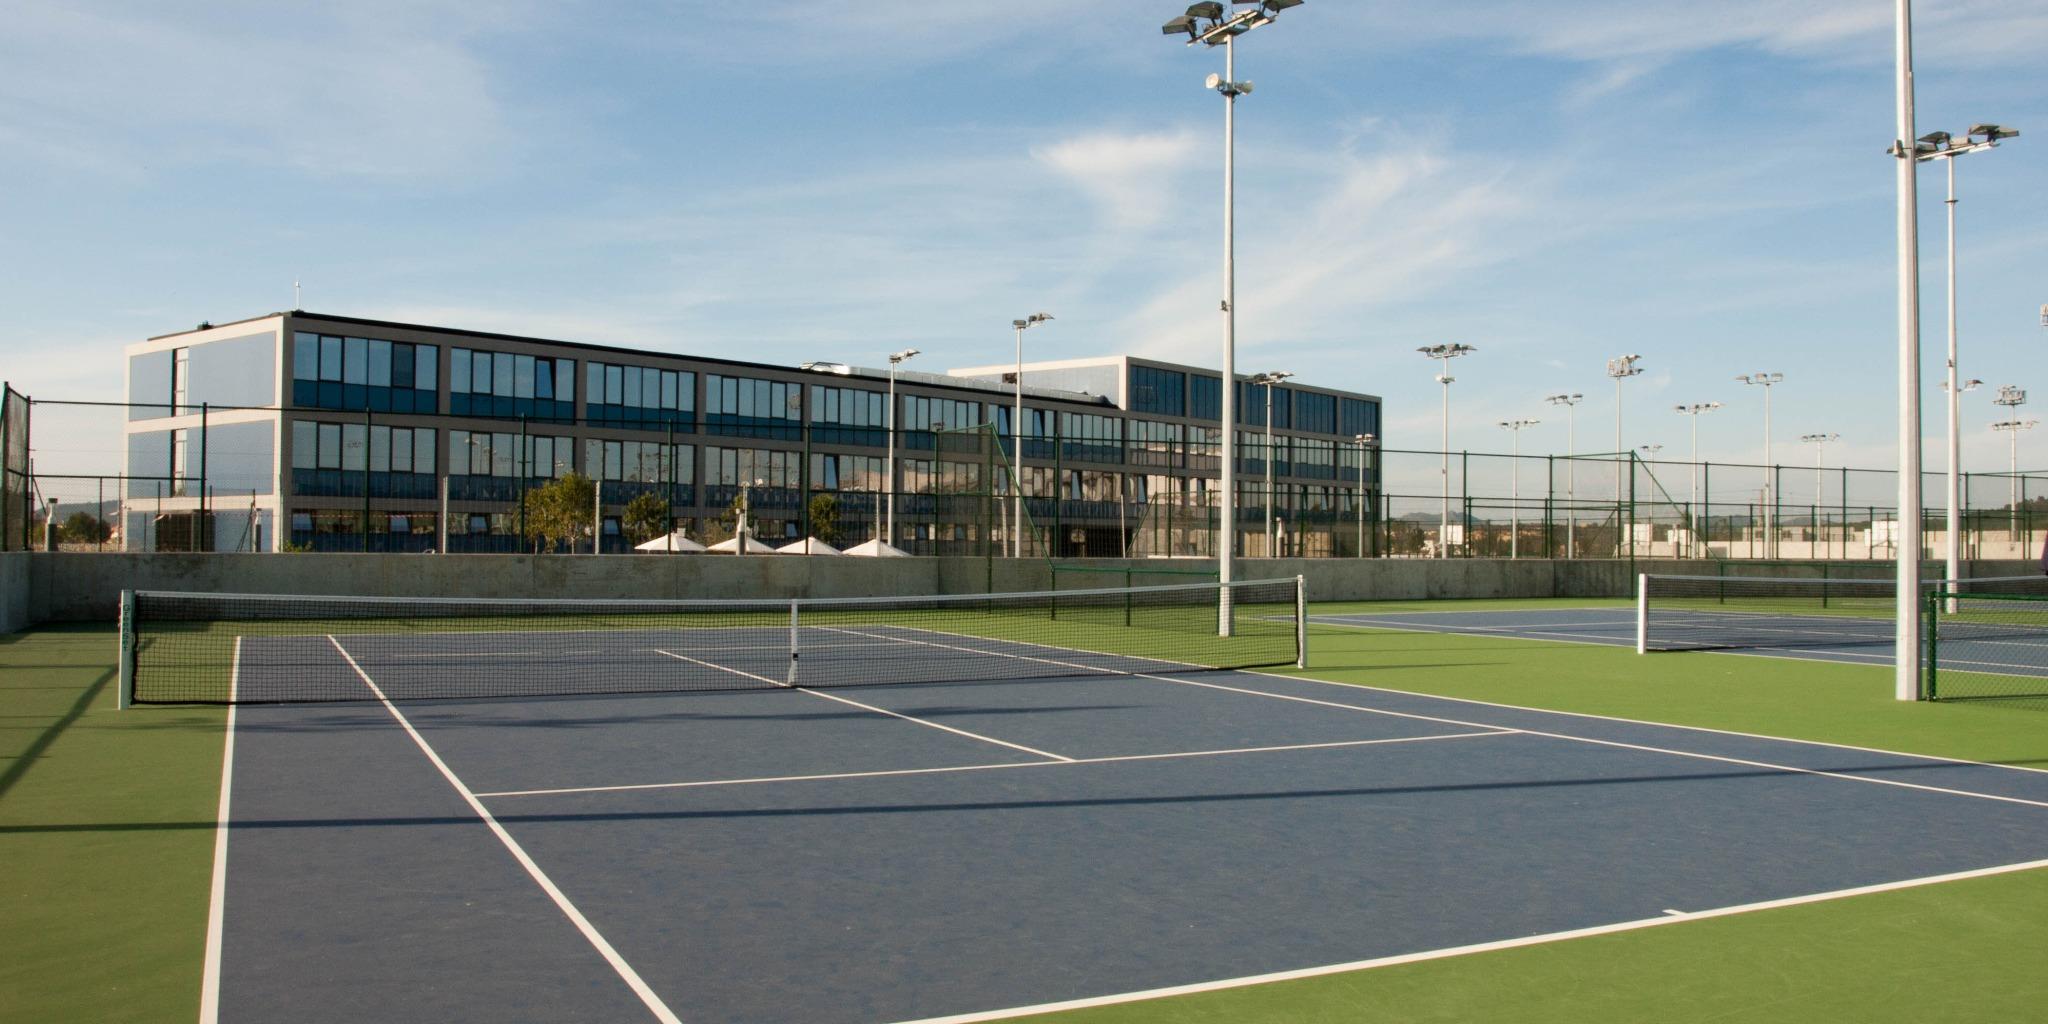 ISI国際学院 小学生 中学生 高校生 夏休み留学 短期留学 テニス留学 ラファ ナダル アカデミー Rafa Nadal Academy アクティビティ付き